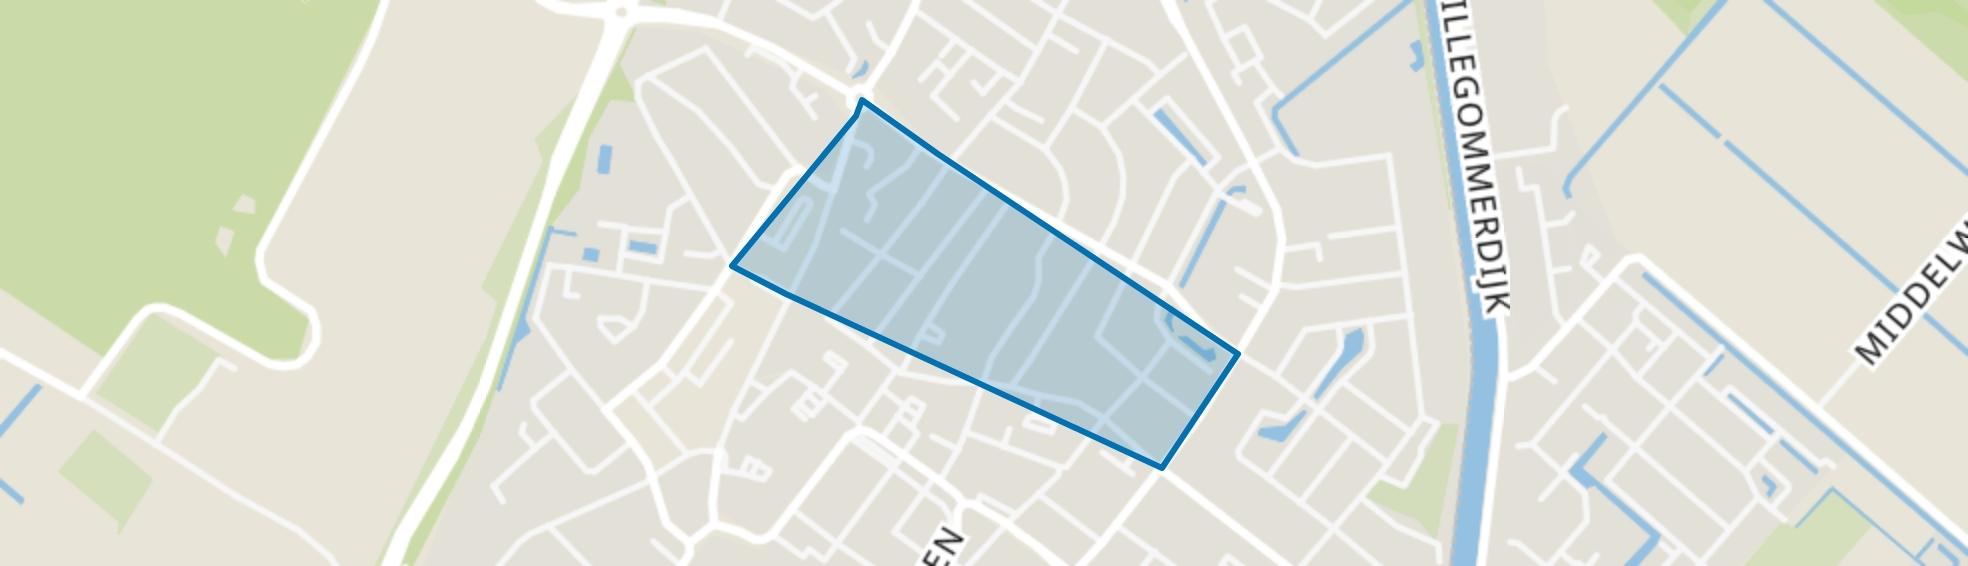 Blokhuis, Lisse map